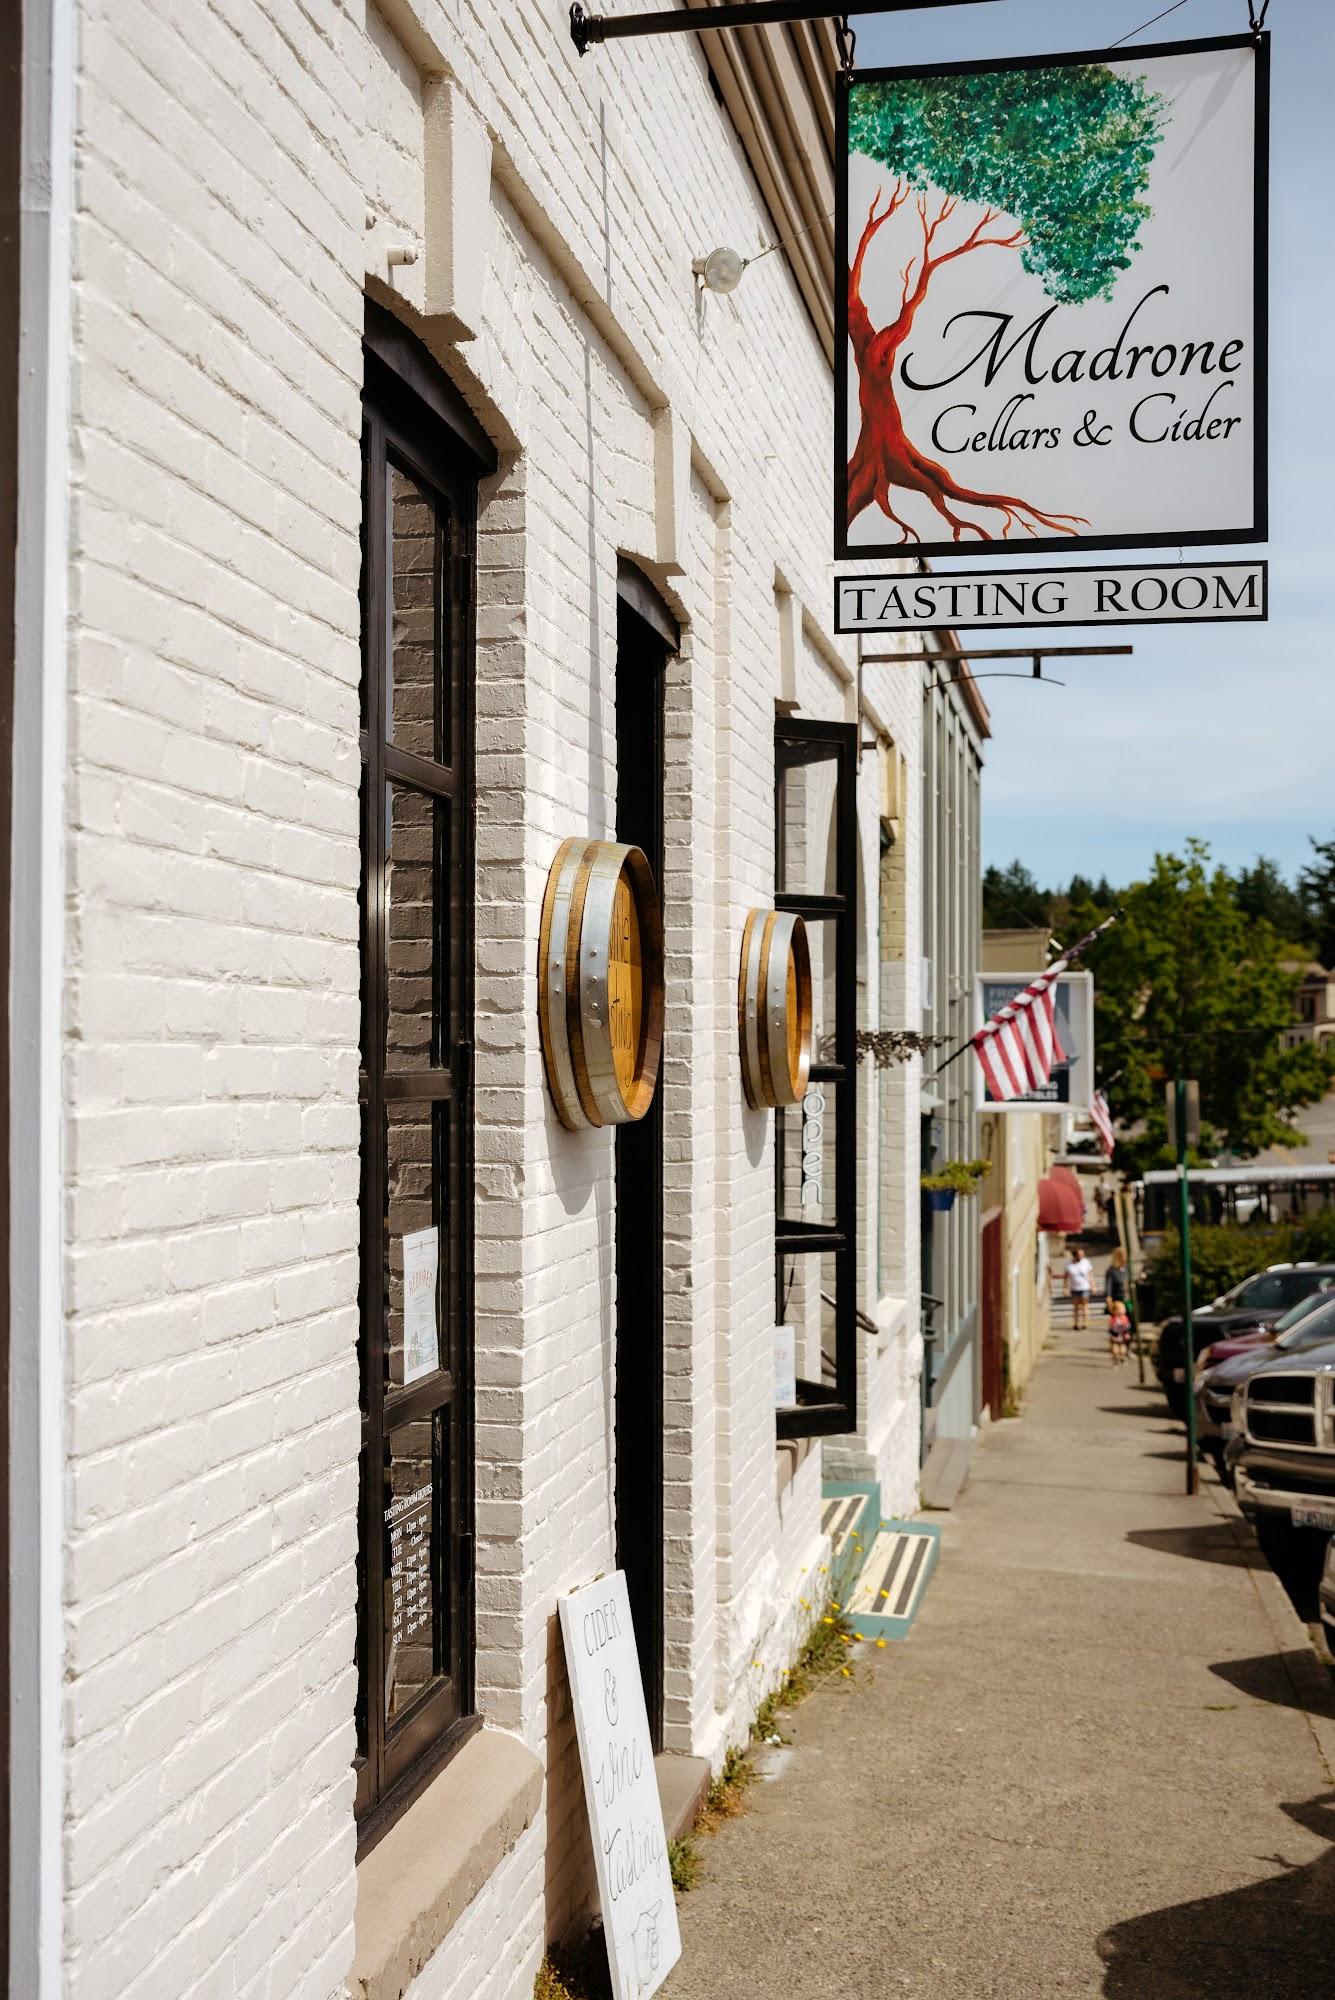 Madrone Cellars & Cider Tasting Room 40 First St S, Friday Harbor